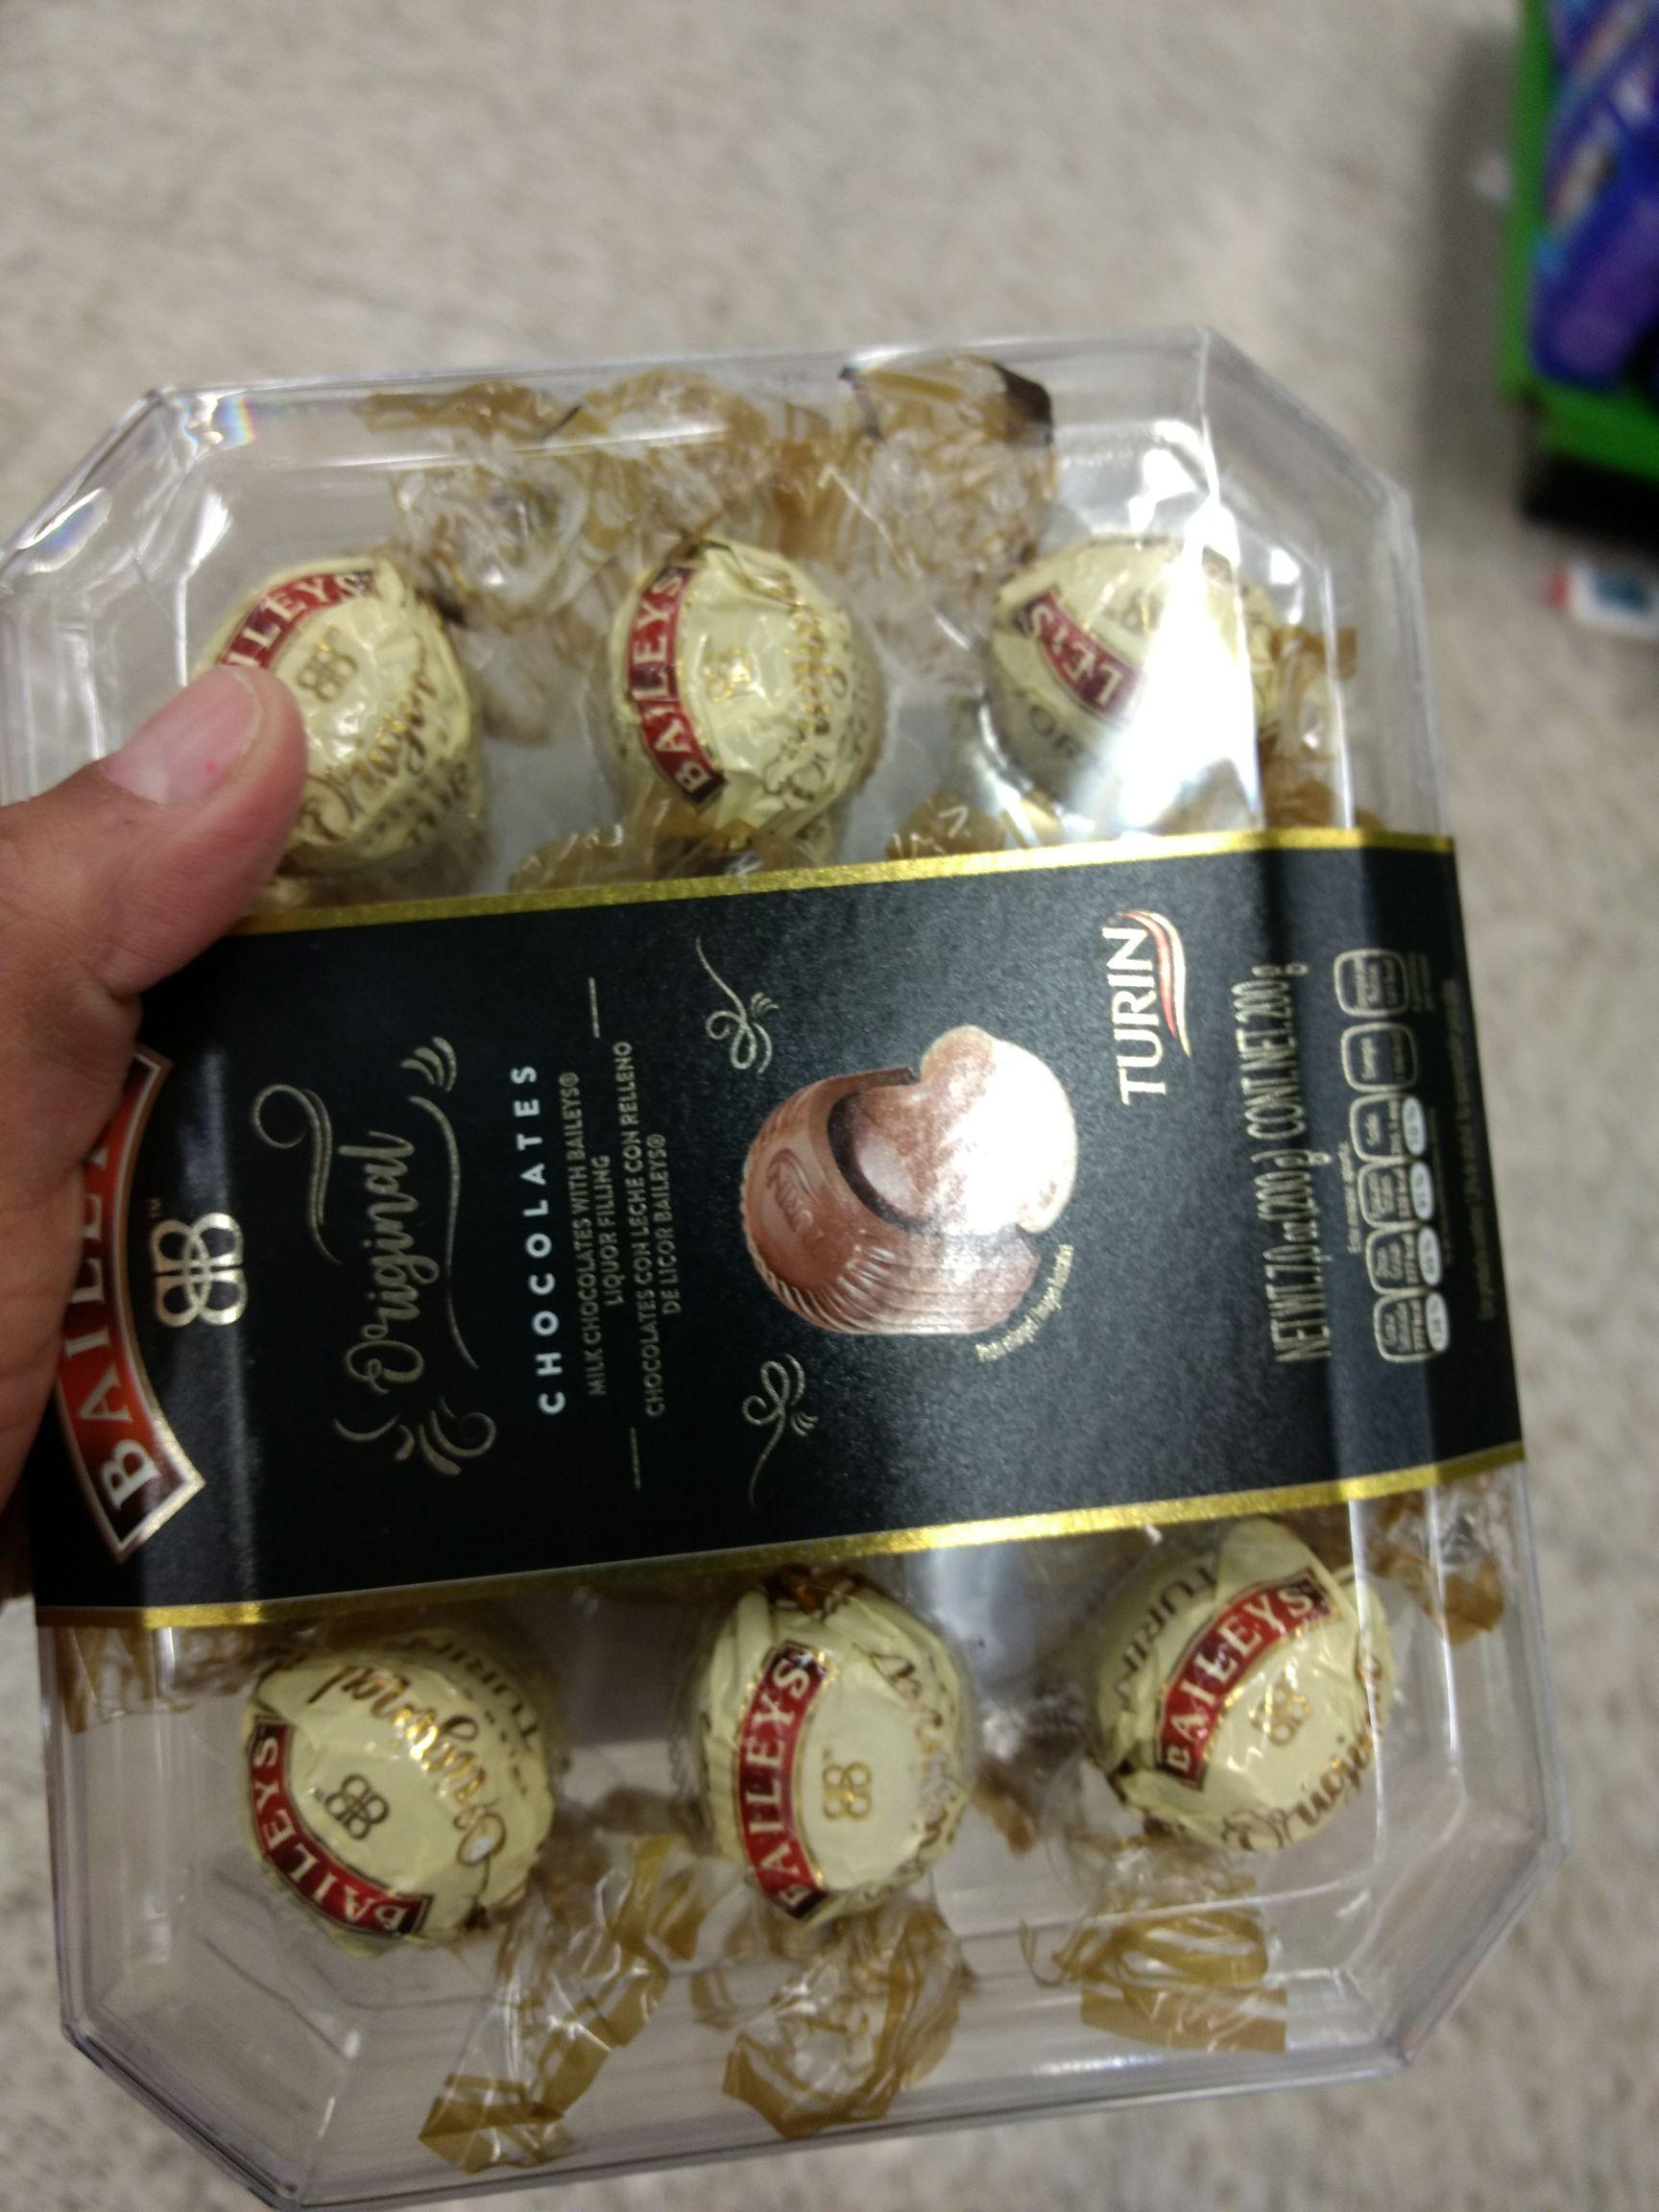 Bodega Aurrera Lomas Estrella CDMX: chocolates Baileys $49.02 , atún Herdez 295 grs $25